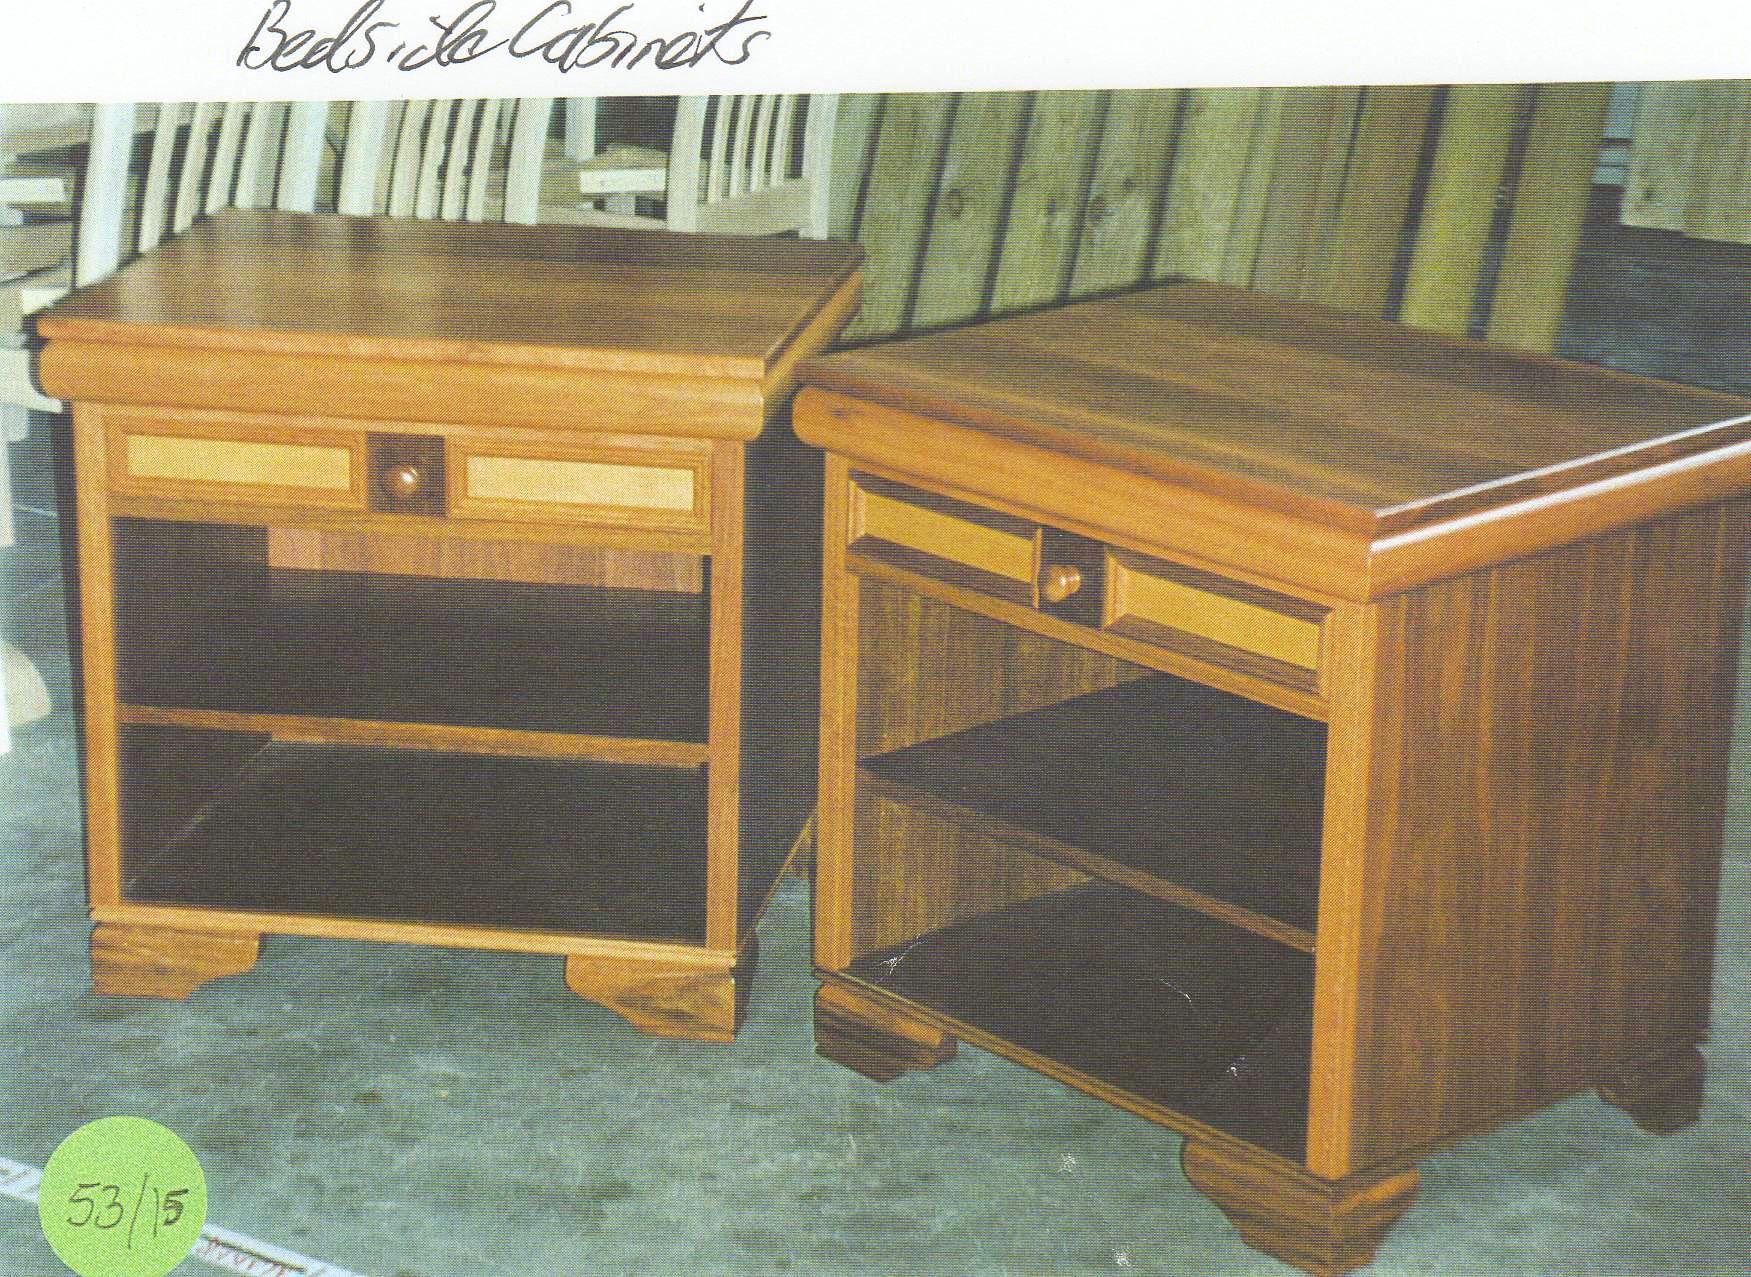 Miko bedside cabinet diy furniture plans technical puzzles for Bedside cabinet plans